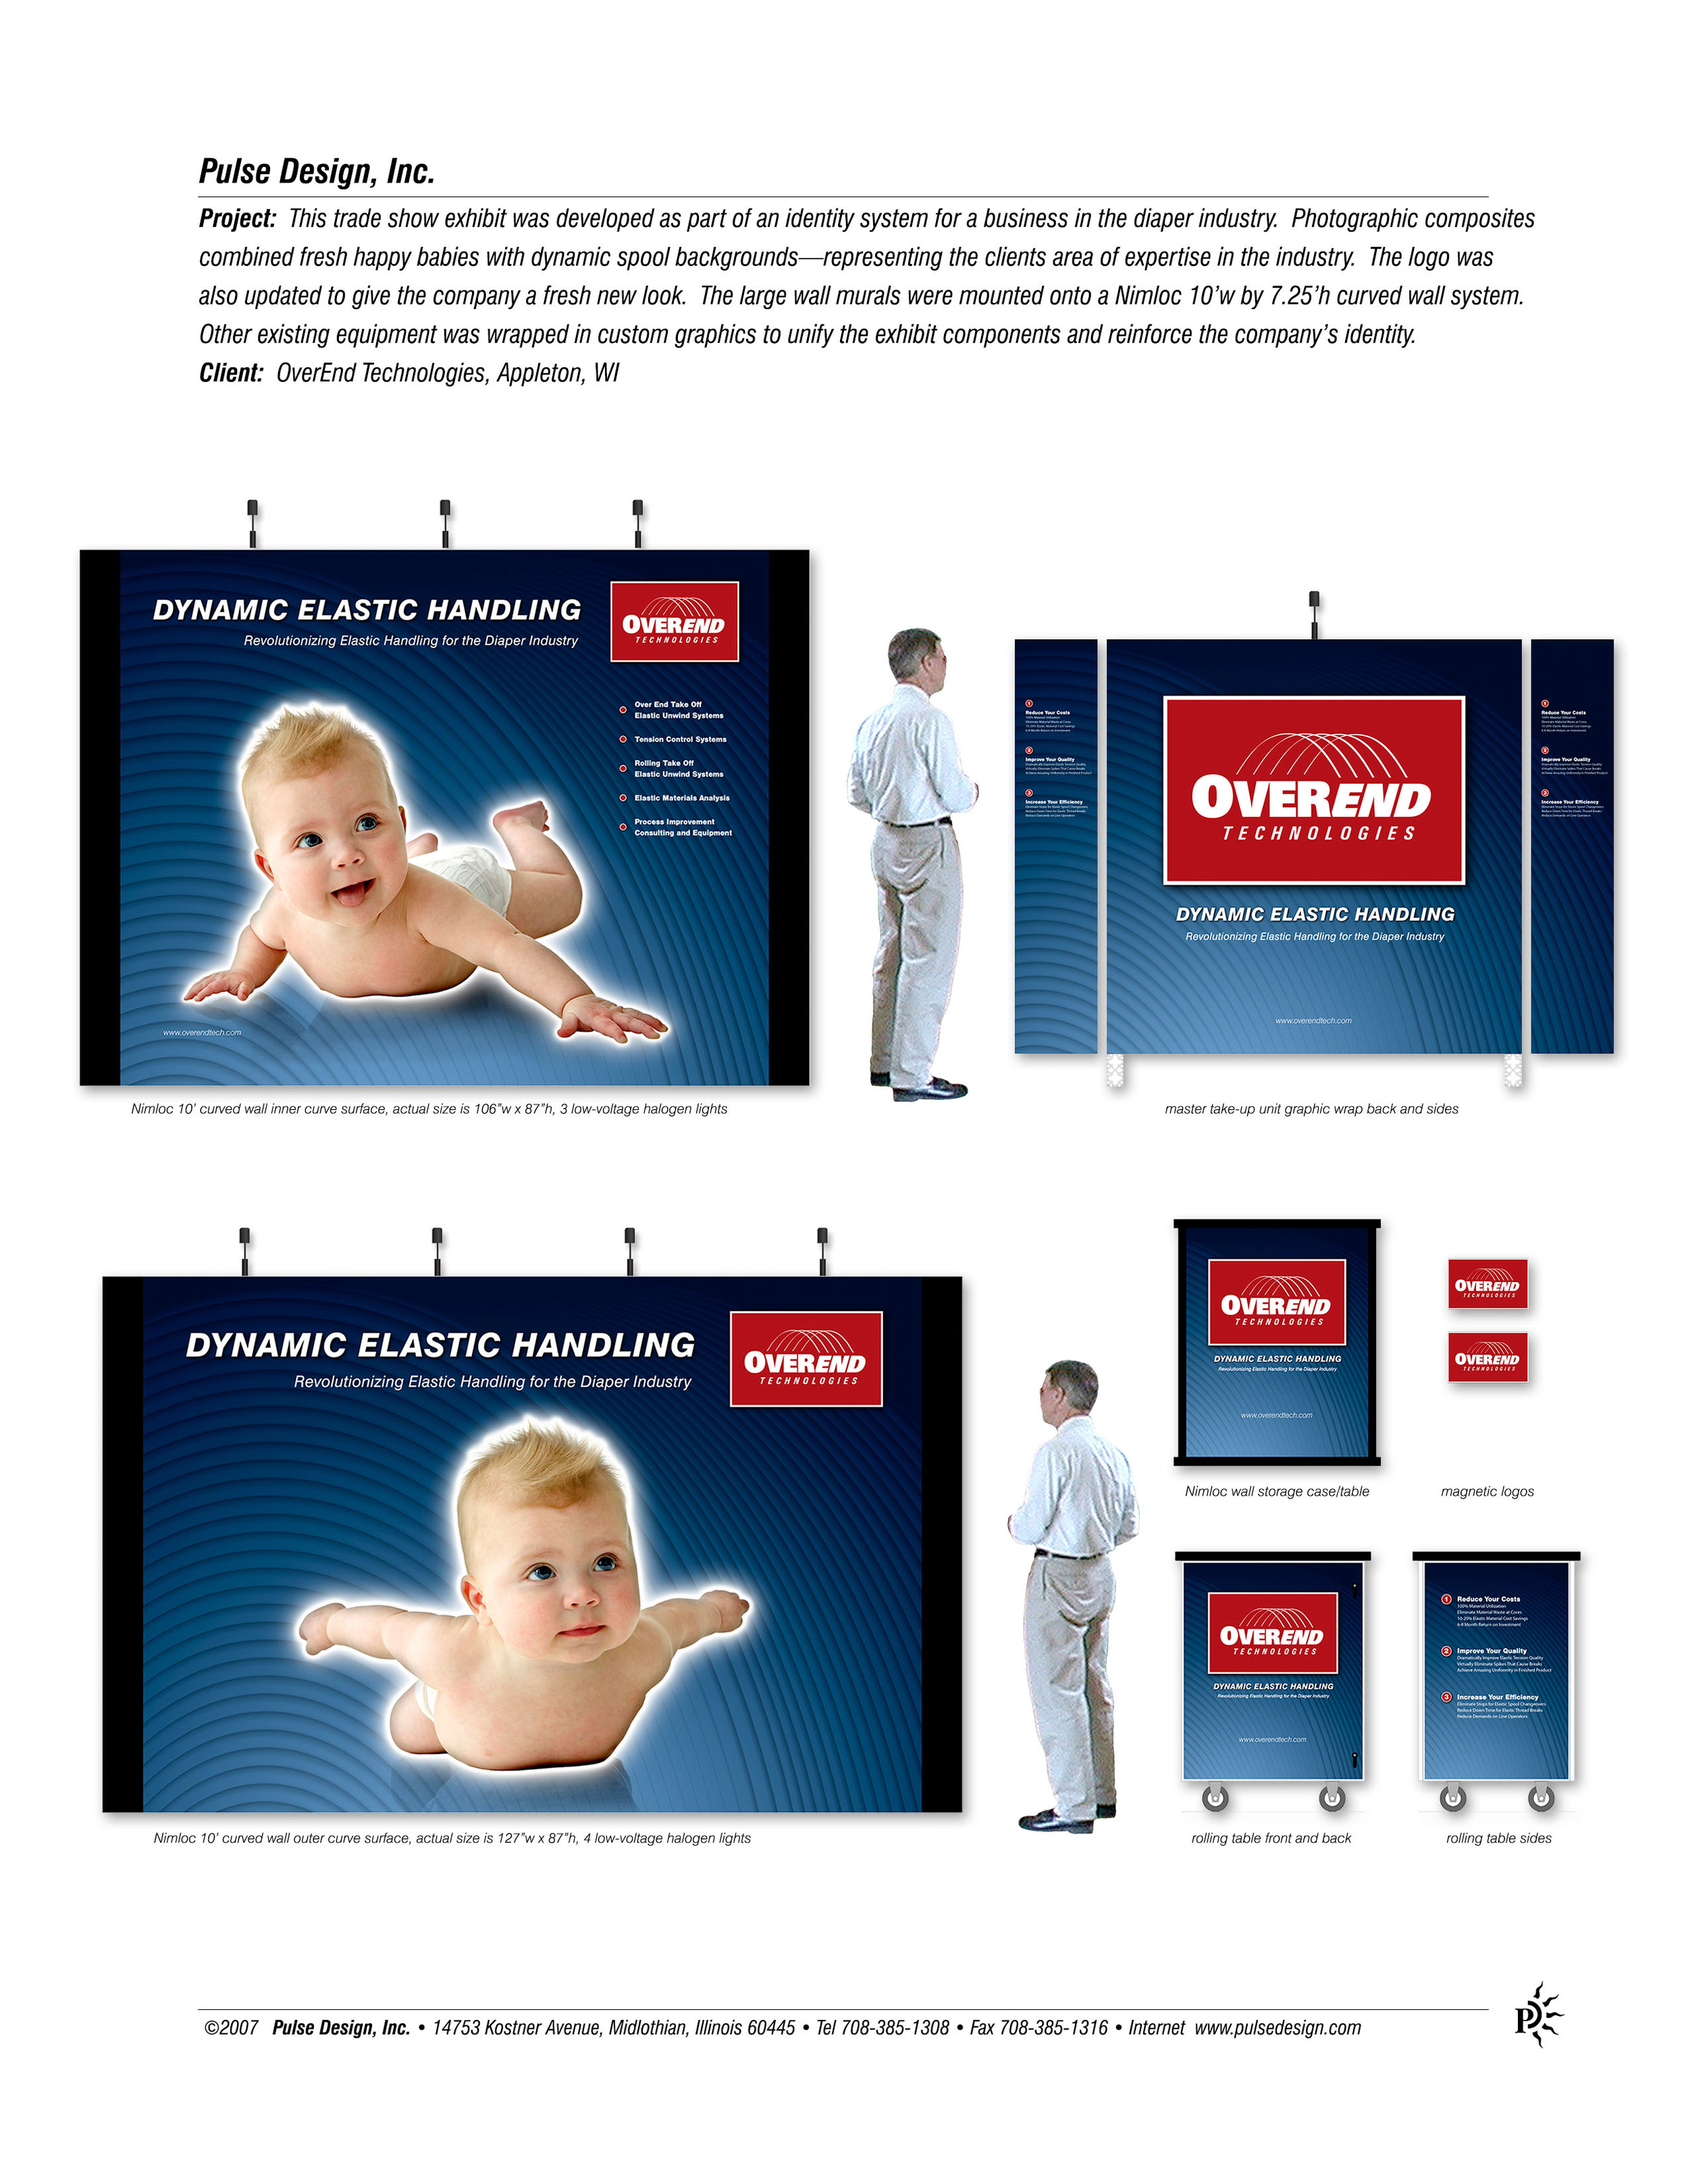 Overend-Trade-Show-Graphics-Pulse-Design-Inc.jpg